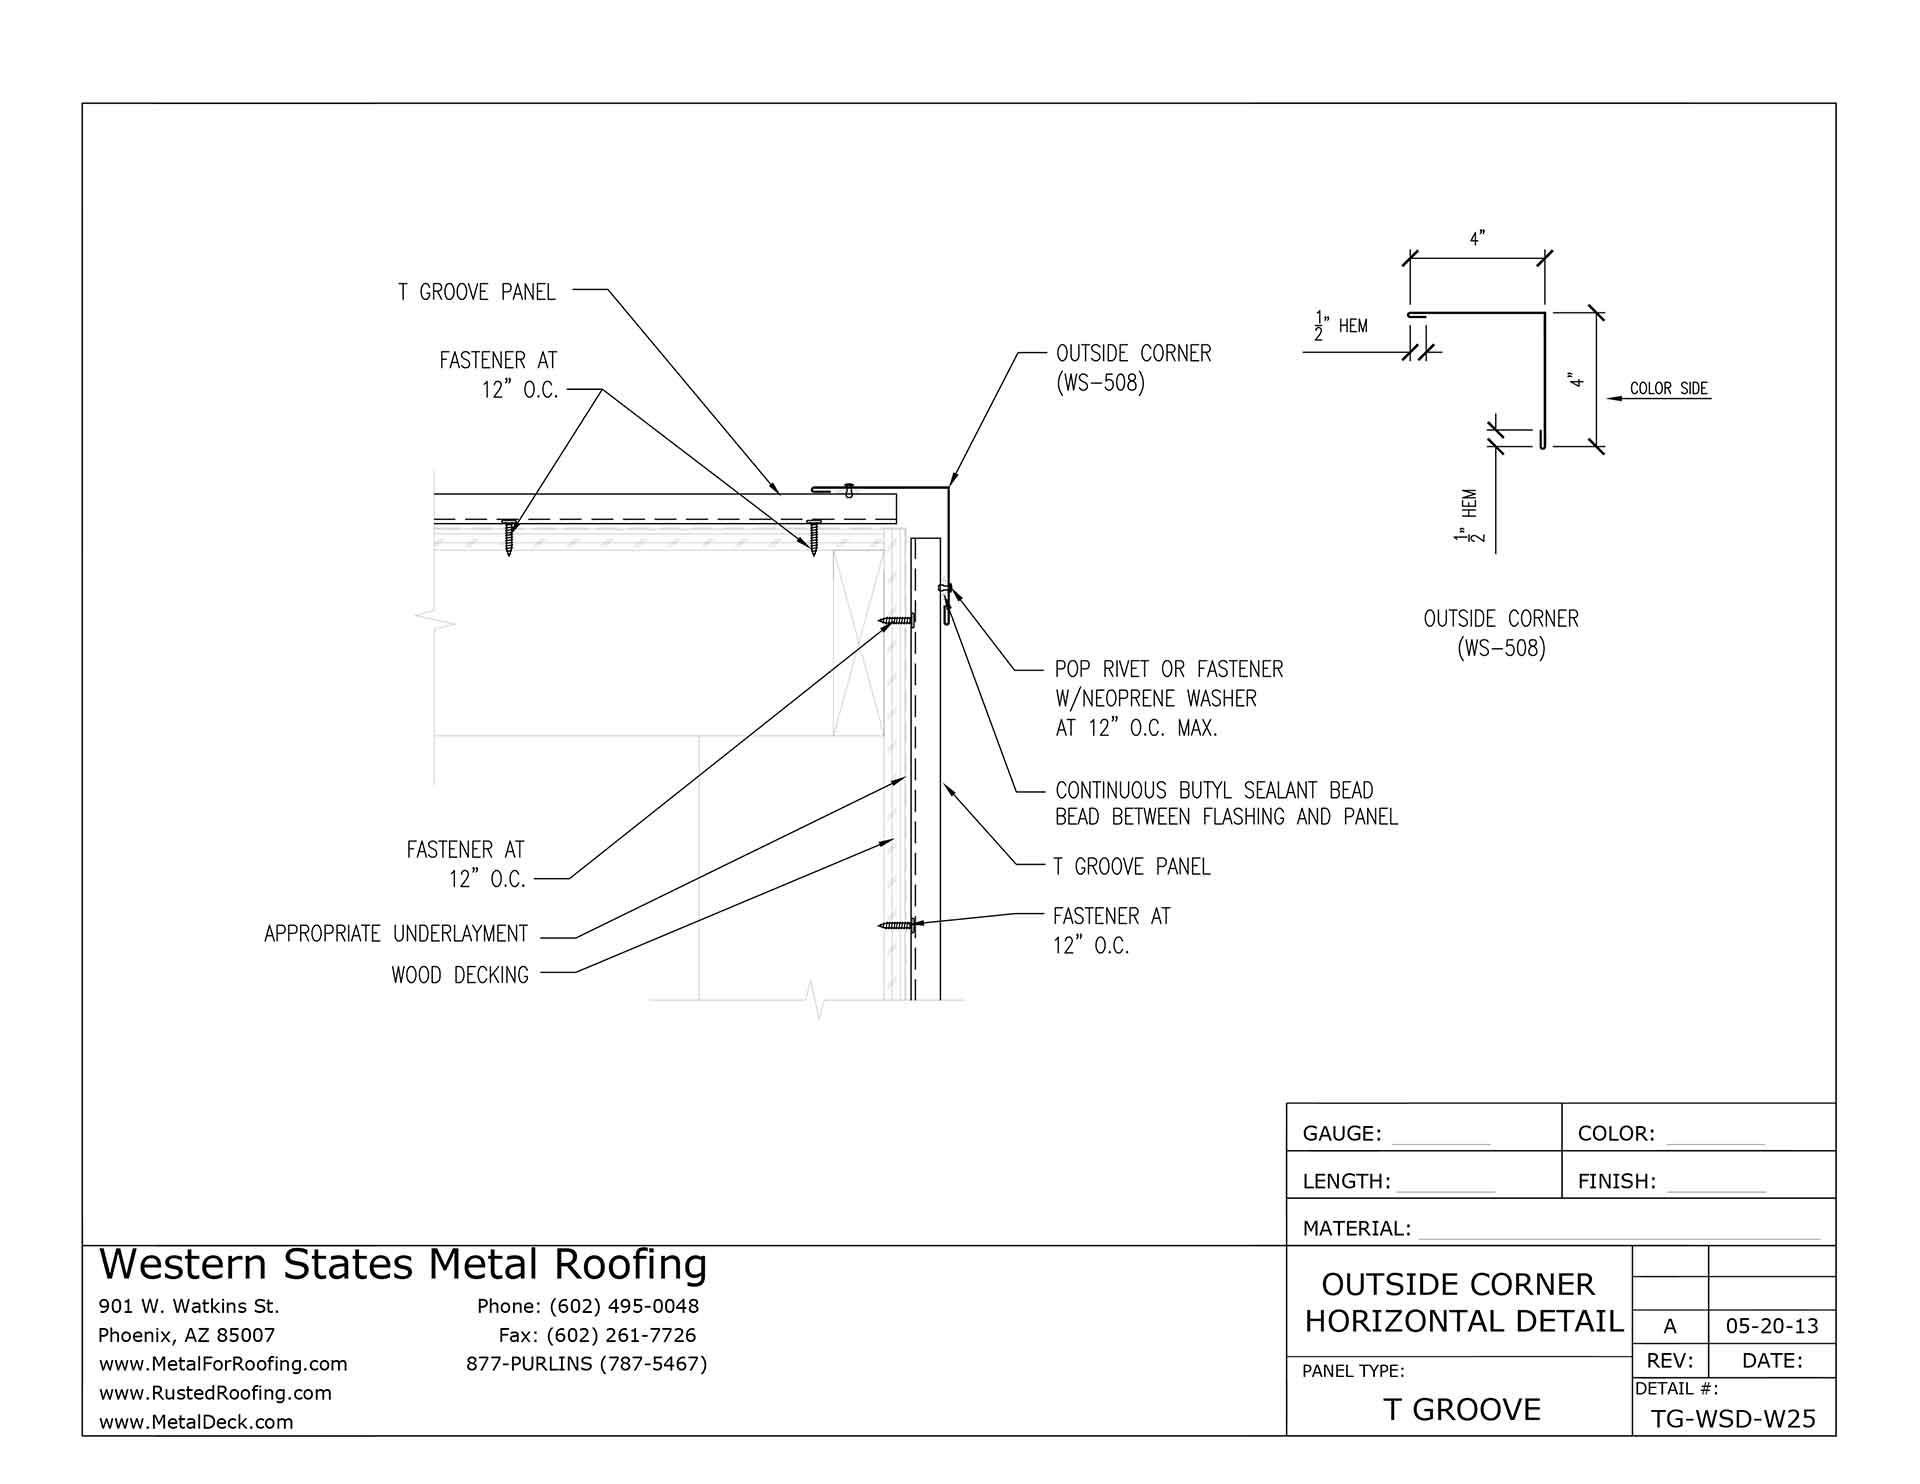 https://f.hubspotusercontent30.net/hubfs/6069238/images/trim-flashings/t-groove/tg-wsd-w25-outside-corner-horizontal-detail.jpg